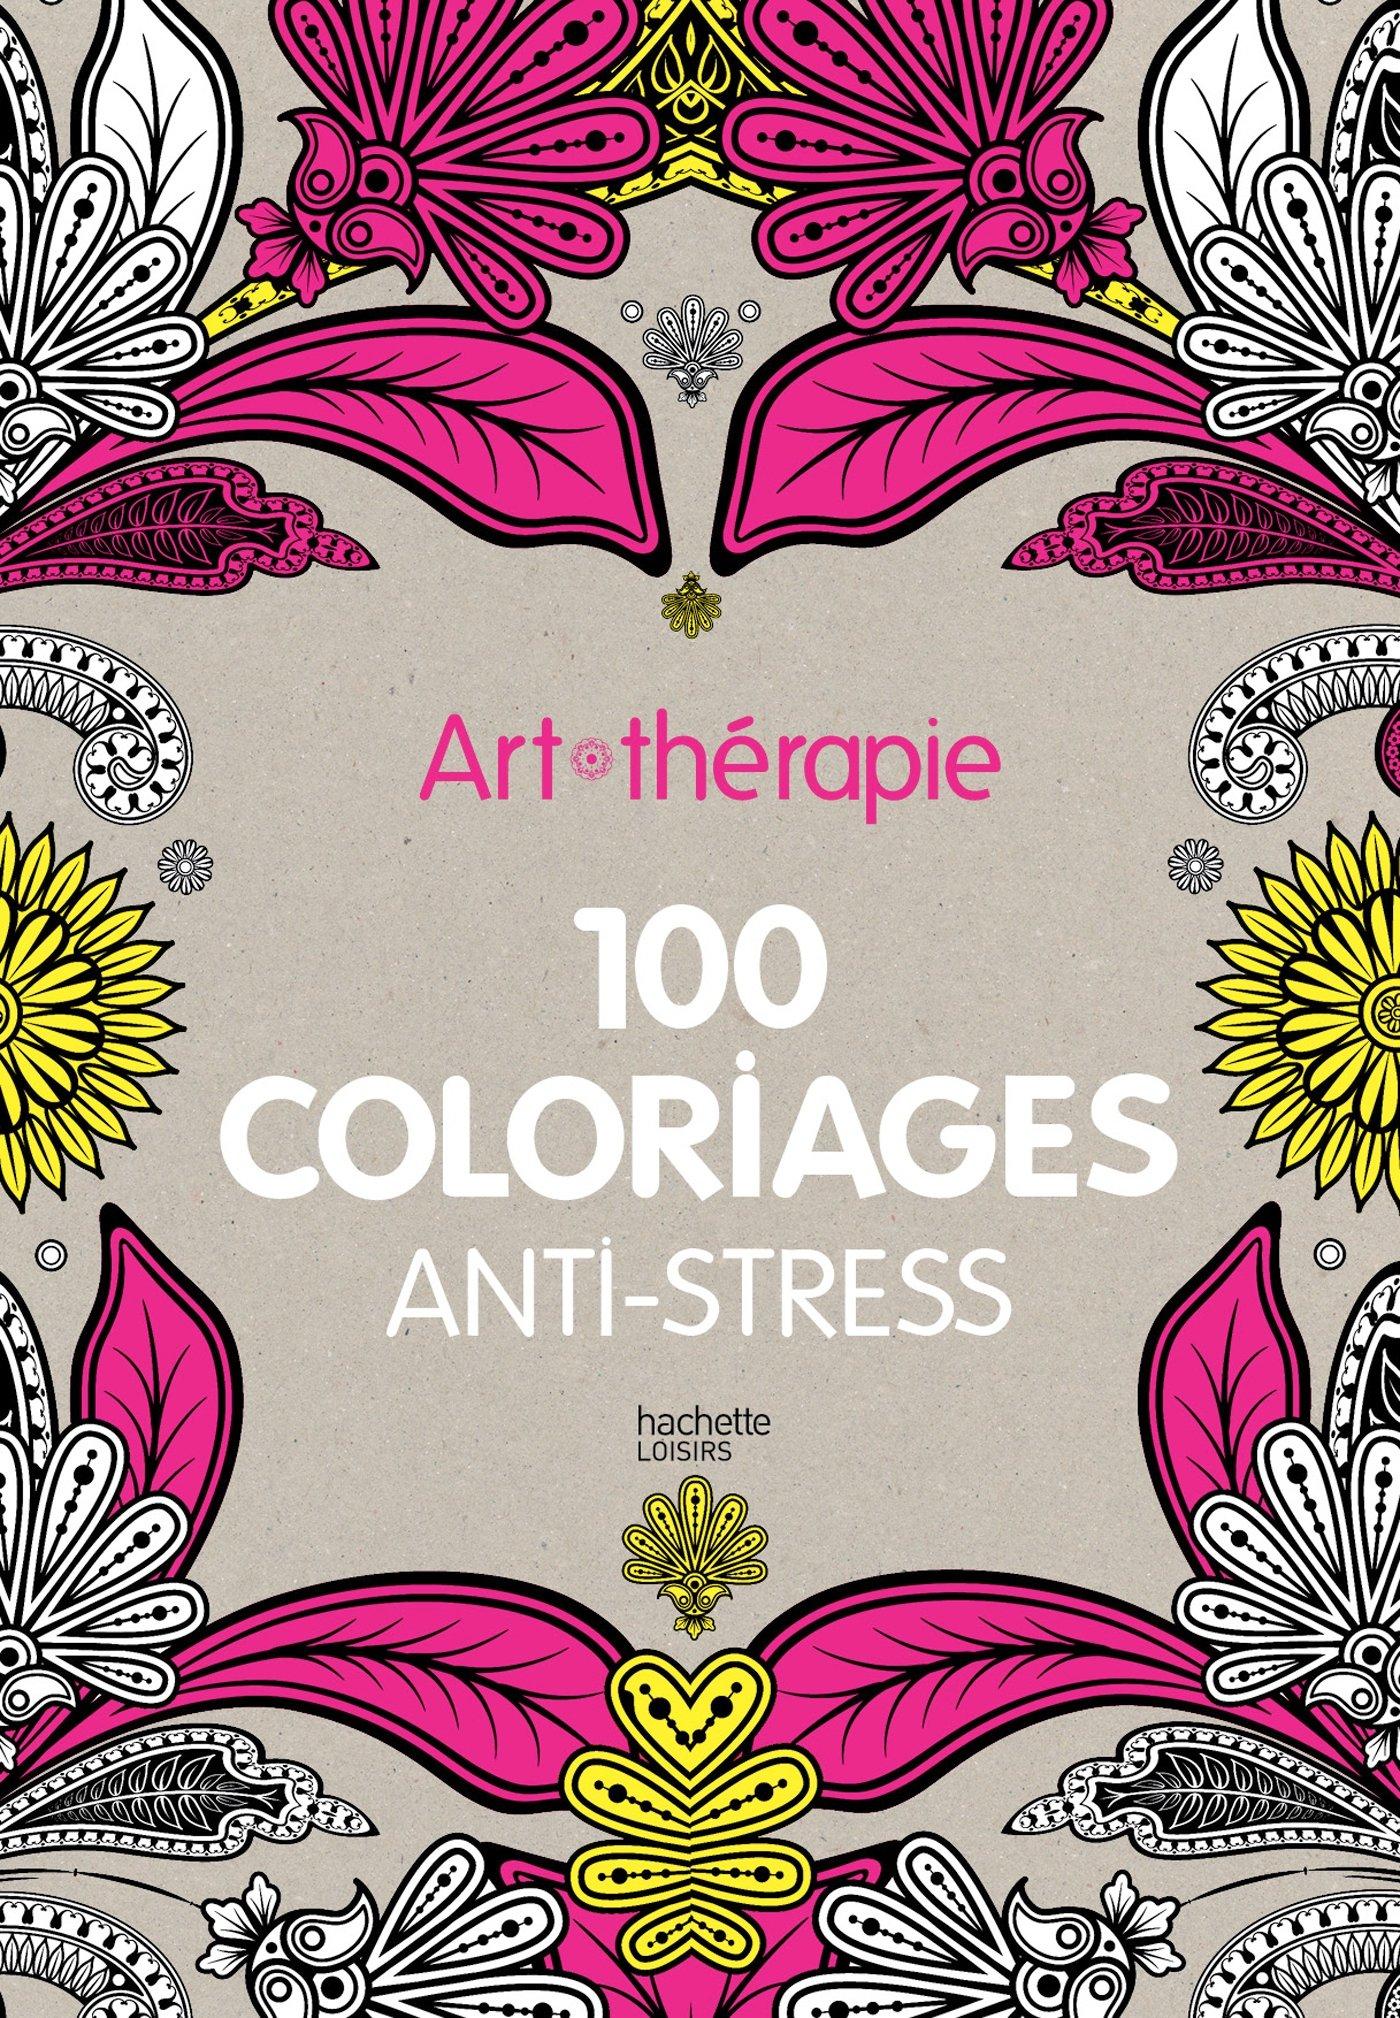 Cahier De Coloriage Adulte | Coloriage Kids encequiconcerne Cahier Coloriage Adulte